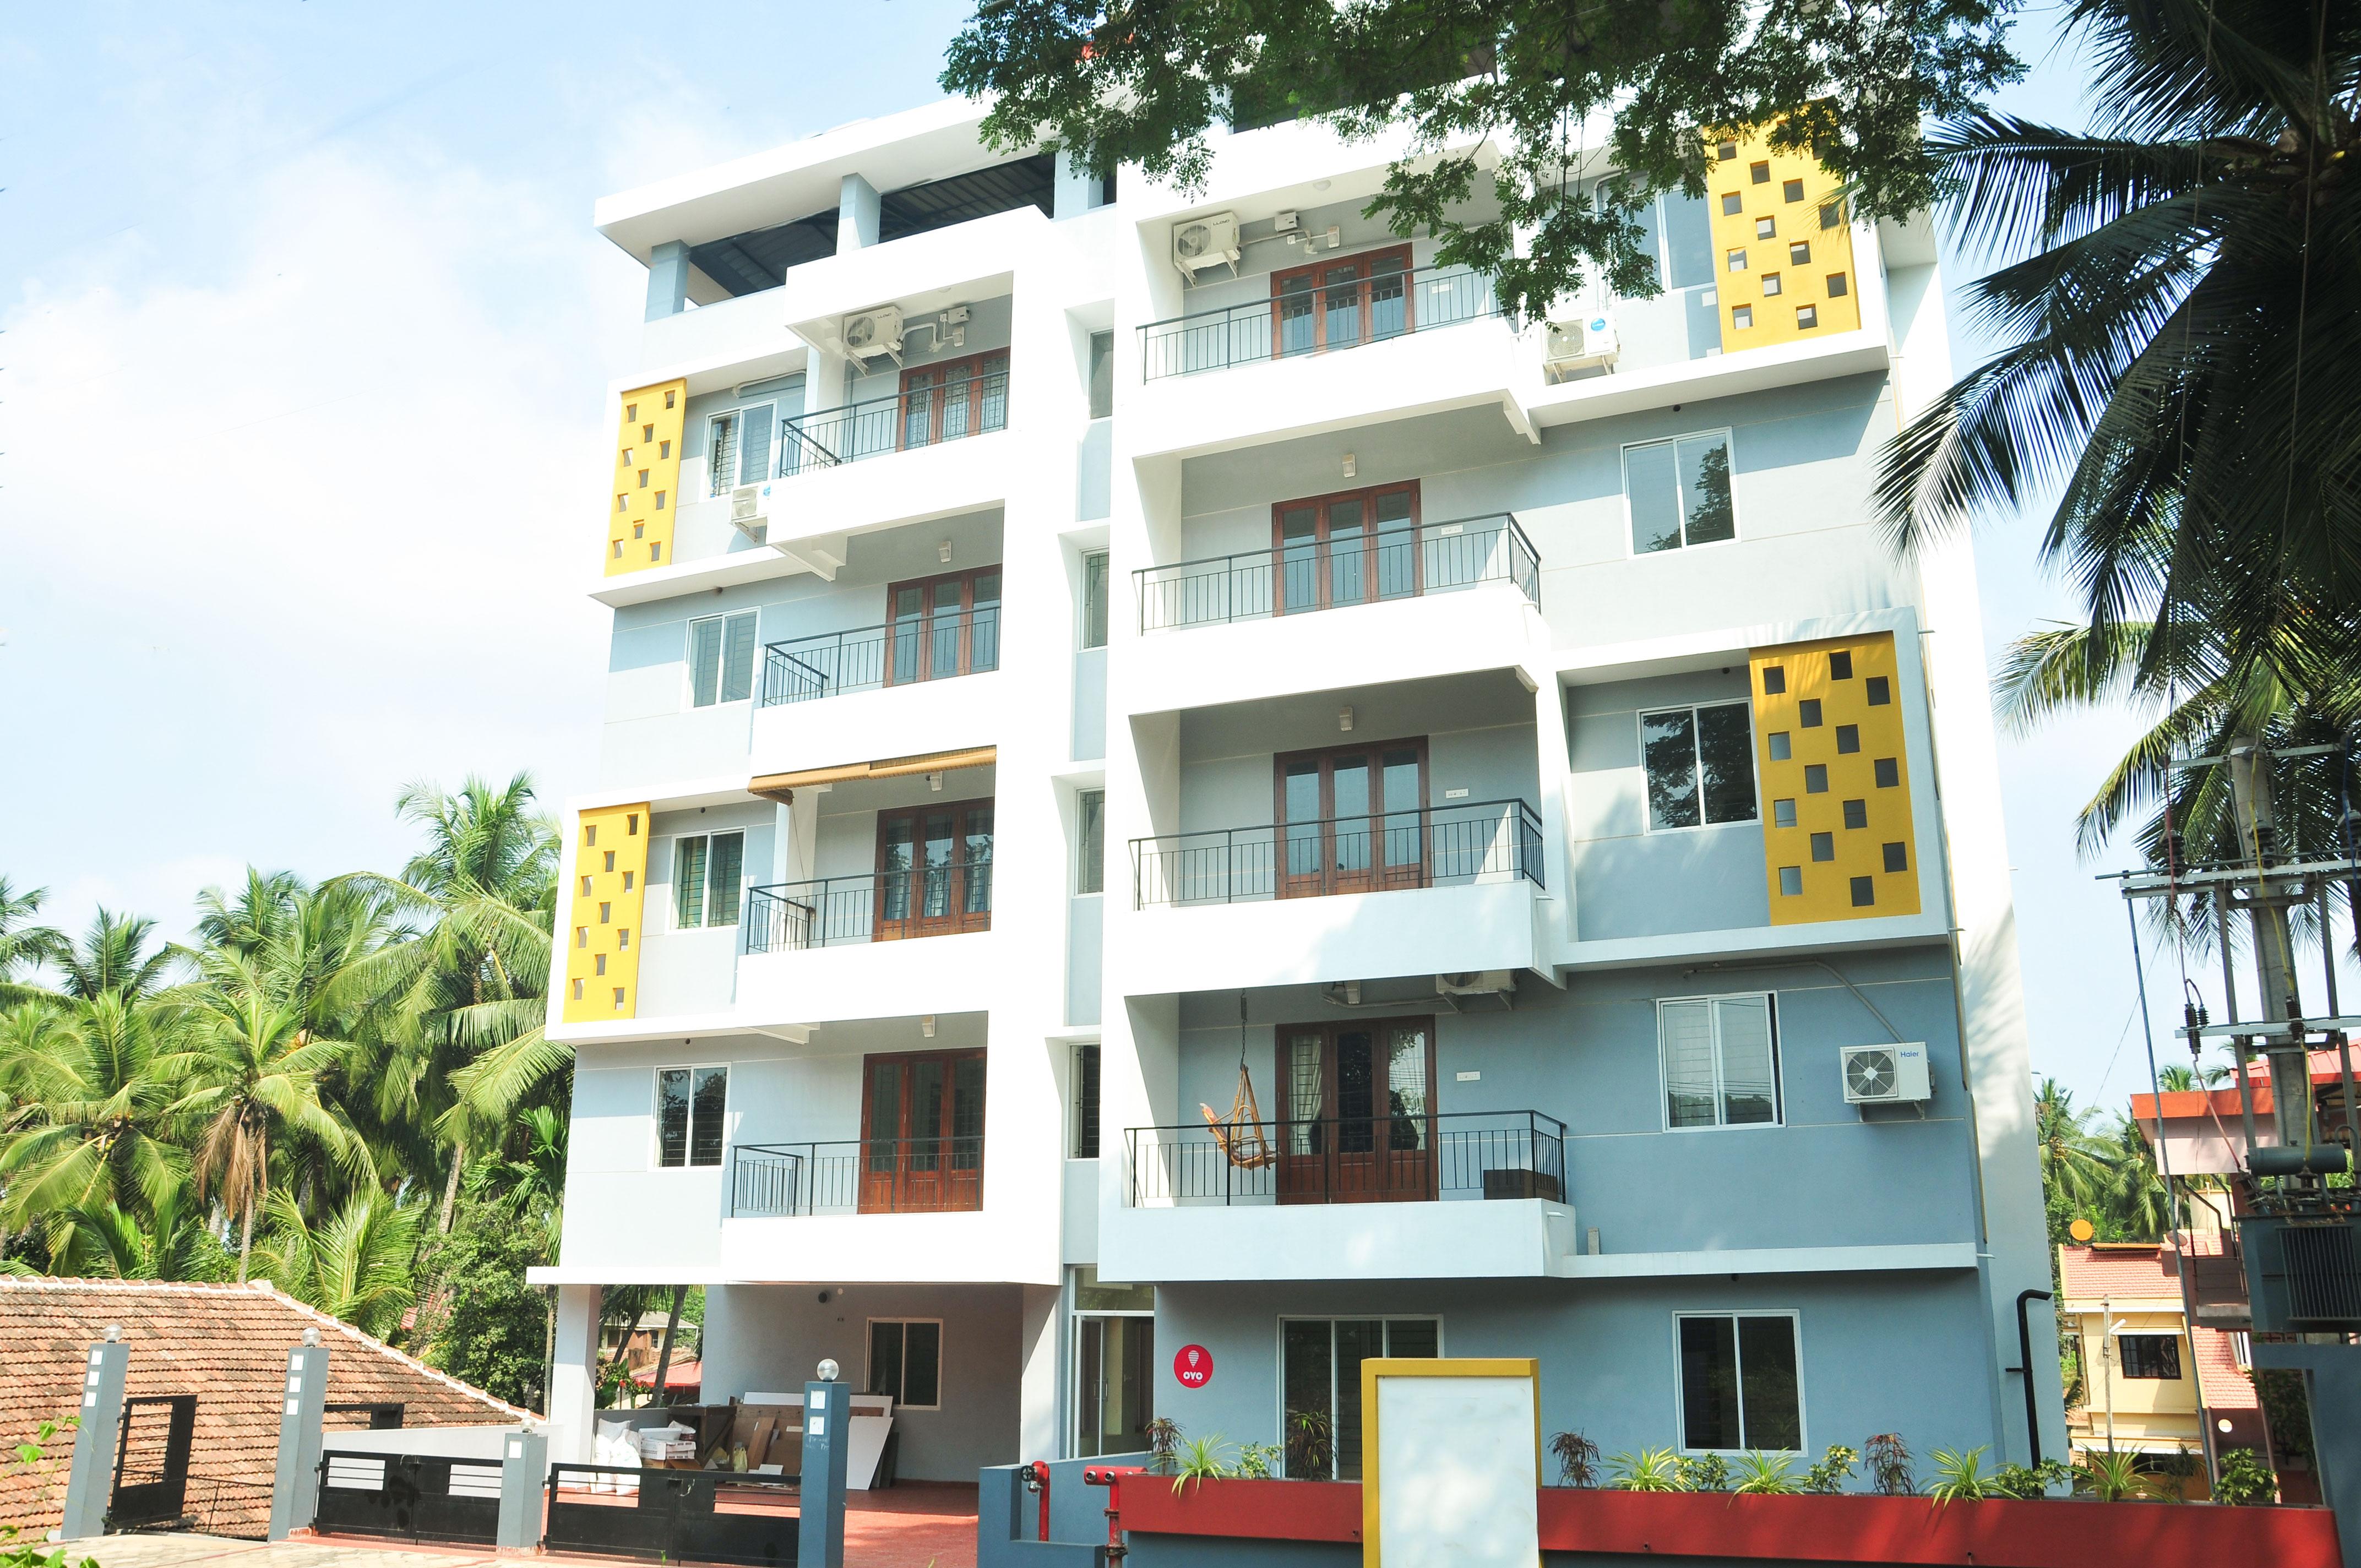 OYO 5123 Apartment near Aj Hospital in Mangalore